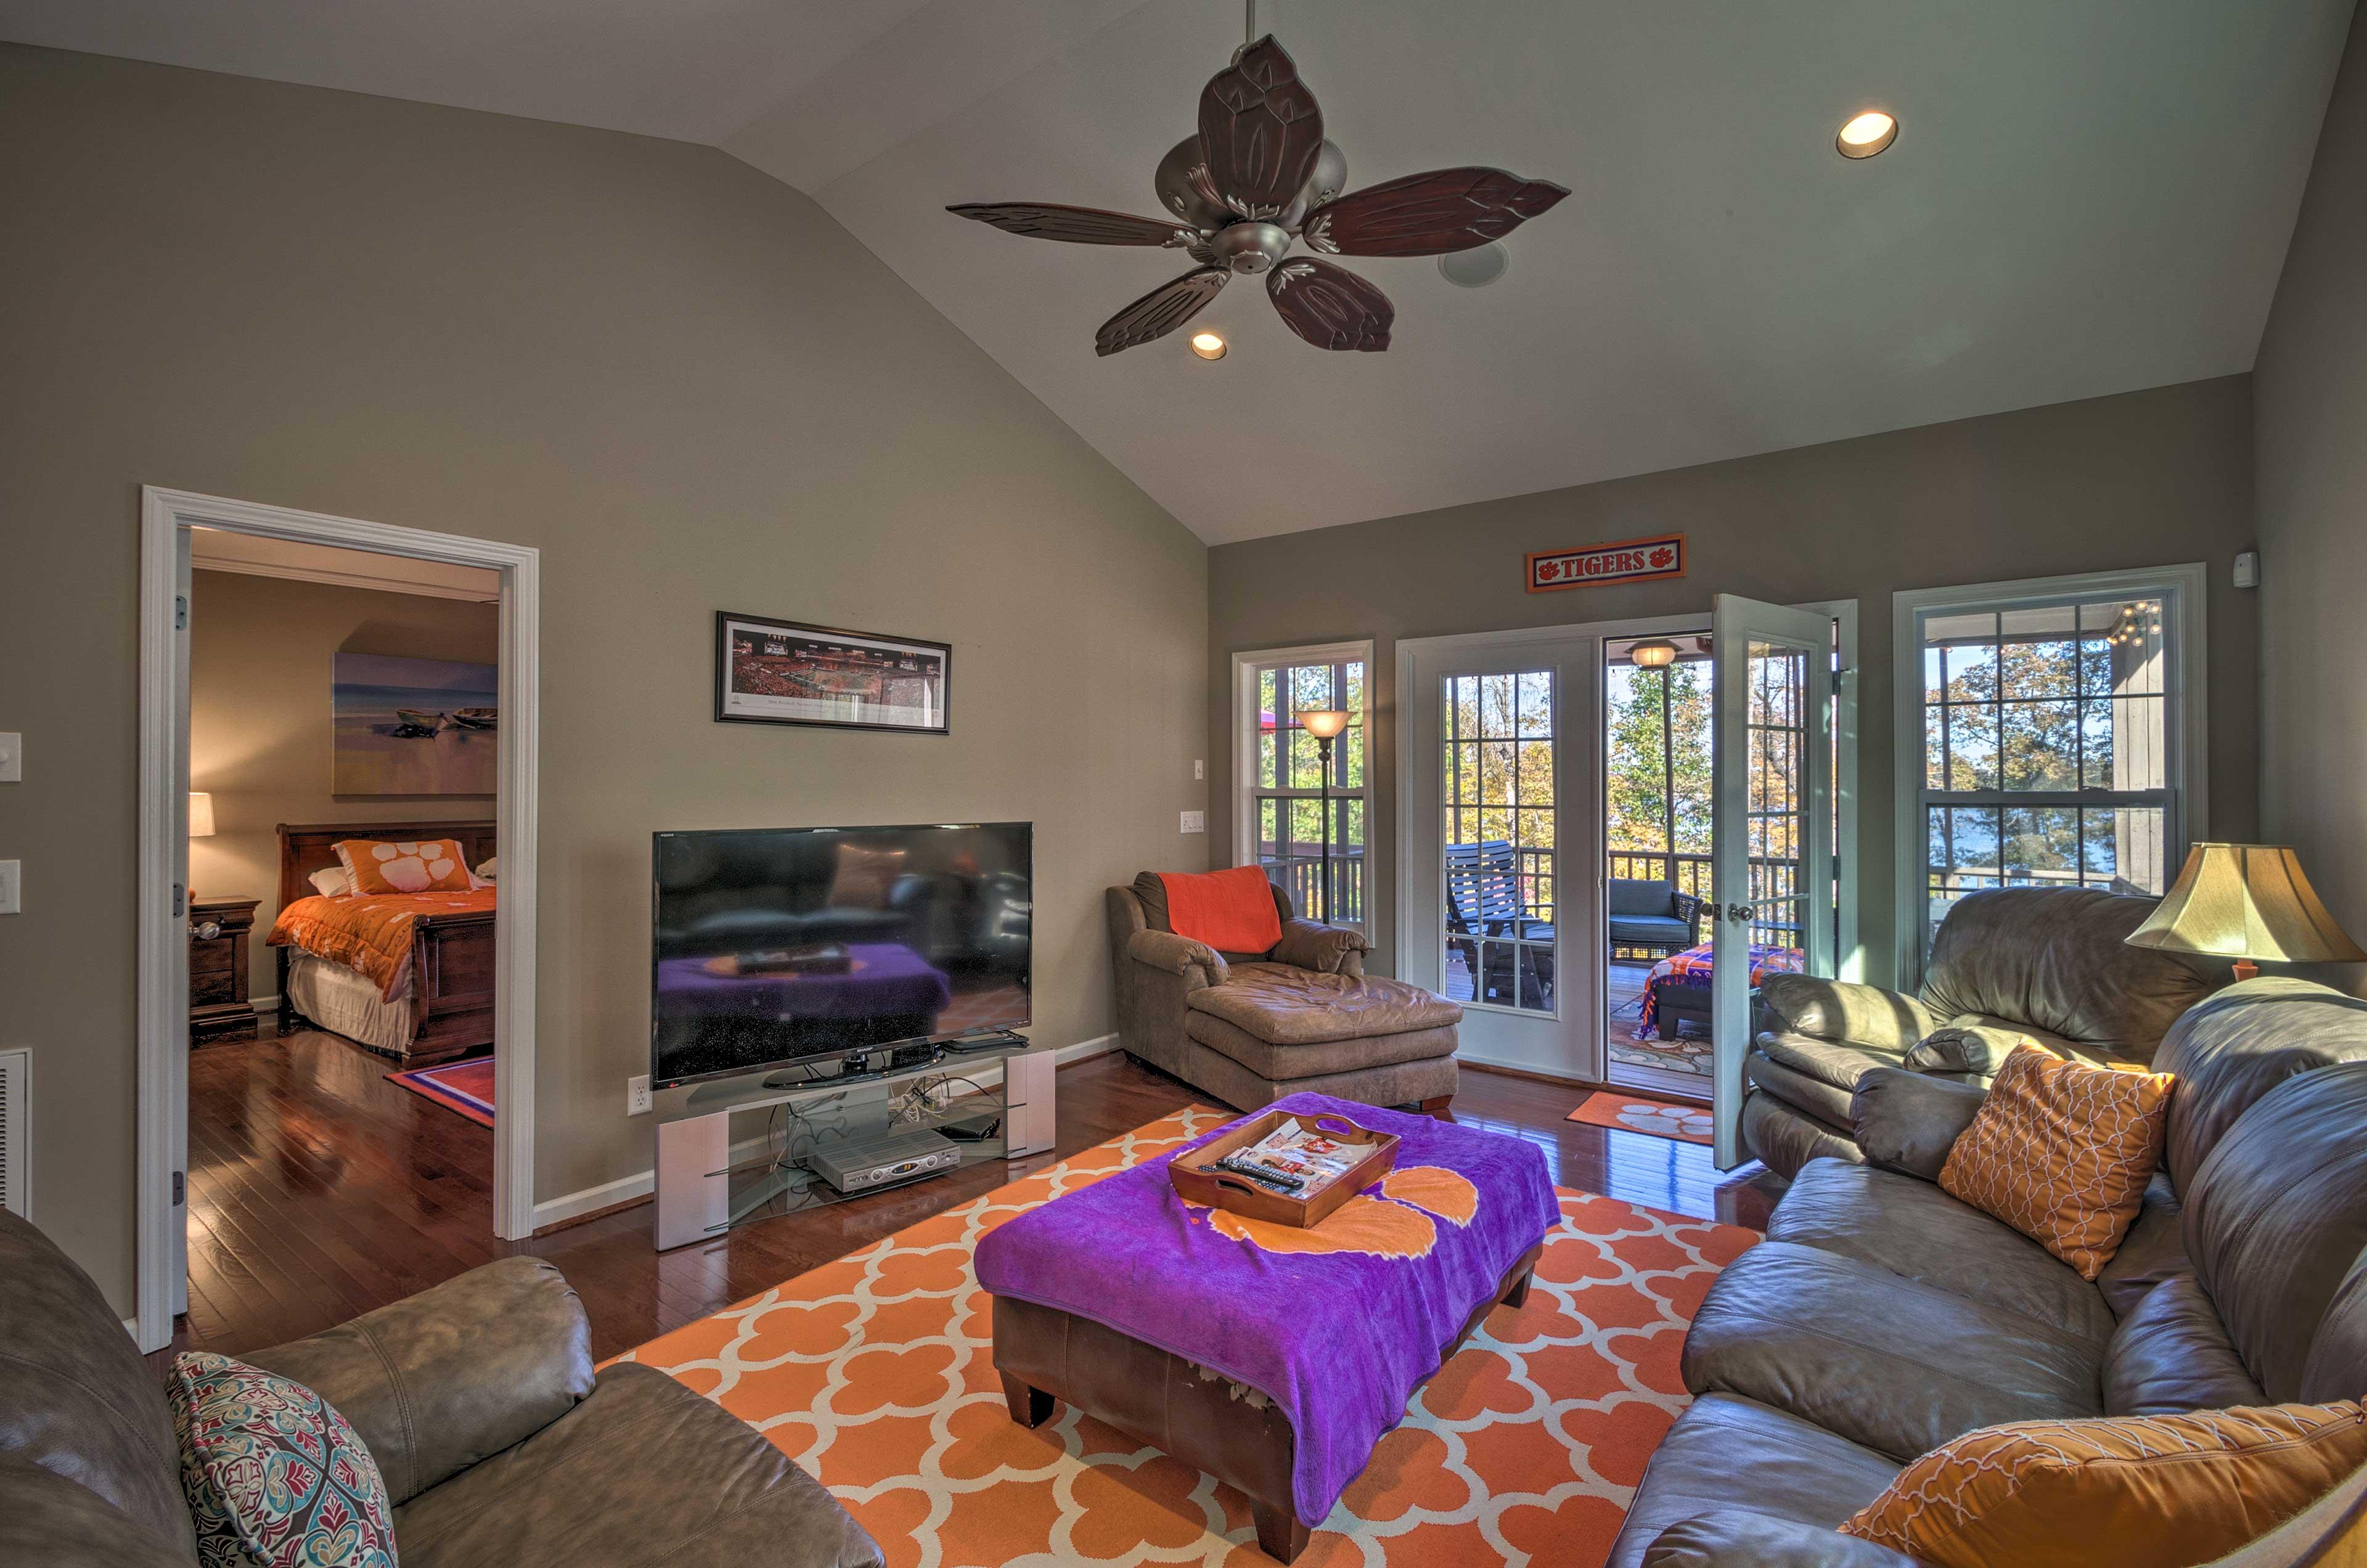 Townhome Interior | Smart TV